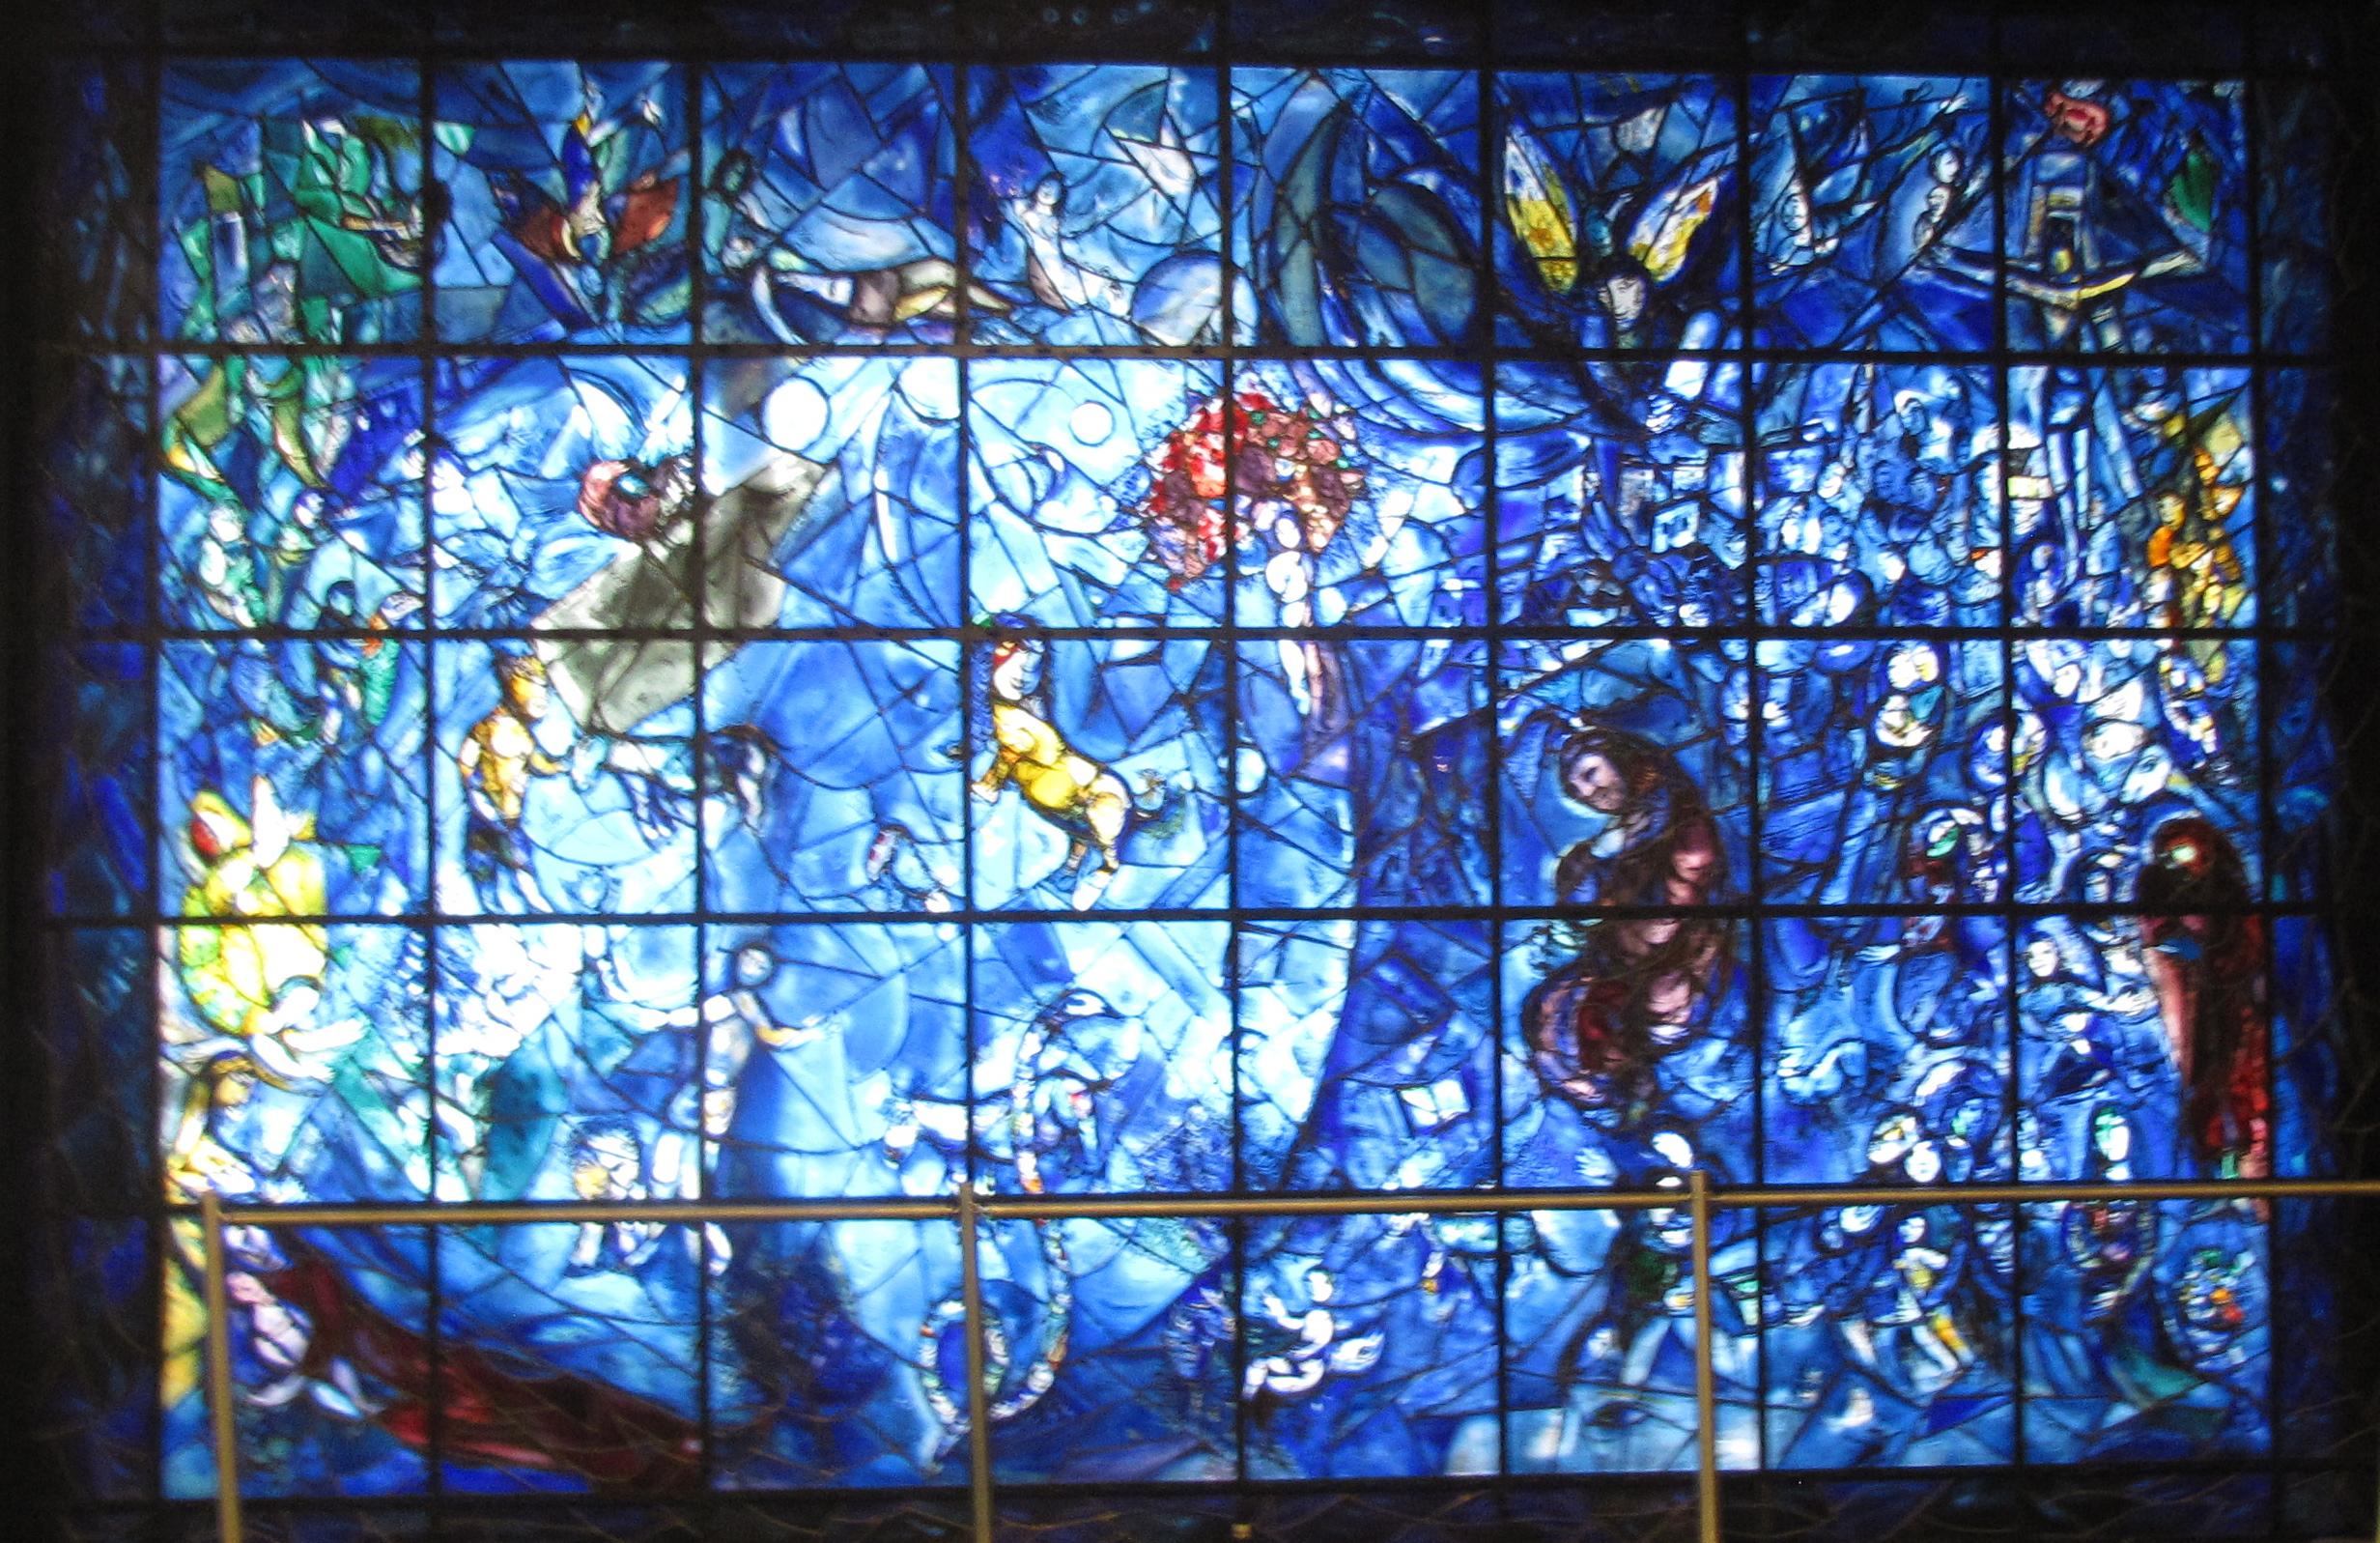 De Ja Vu at the United Nations | What Next? Chagall Mainz